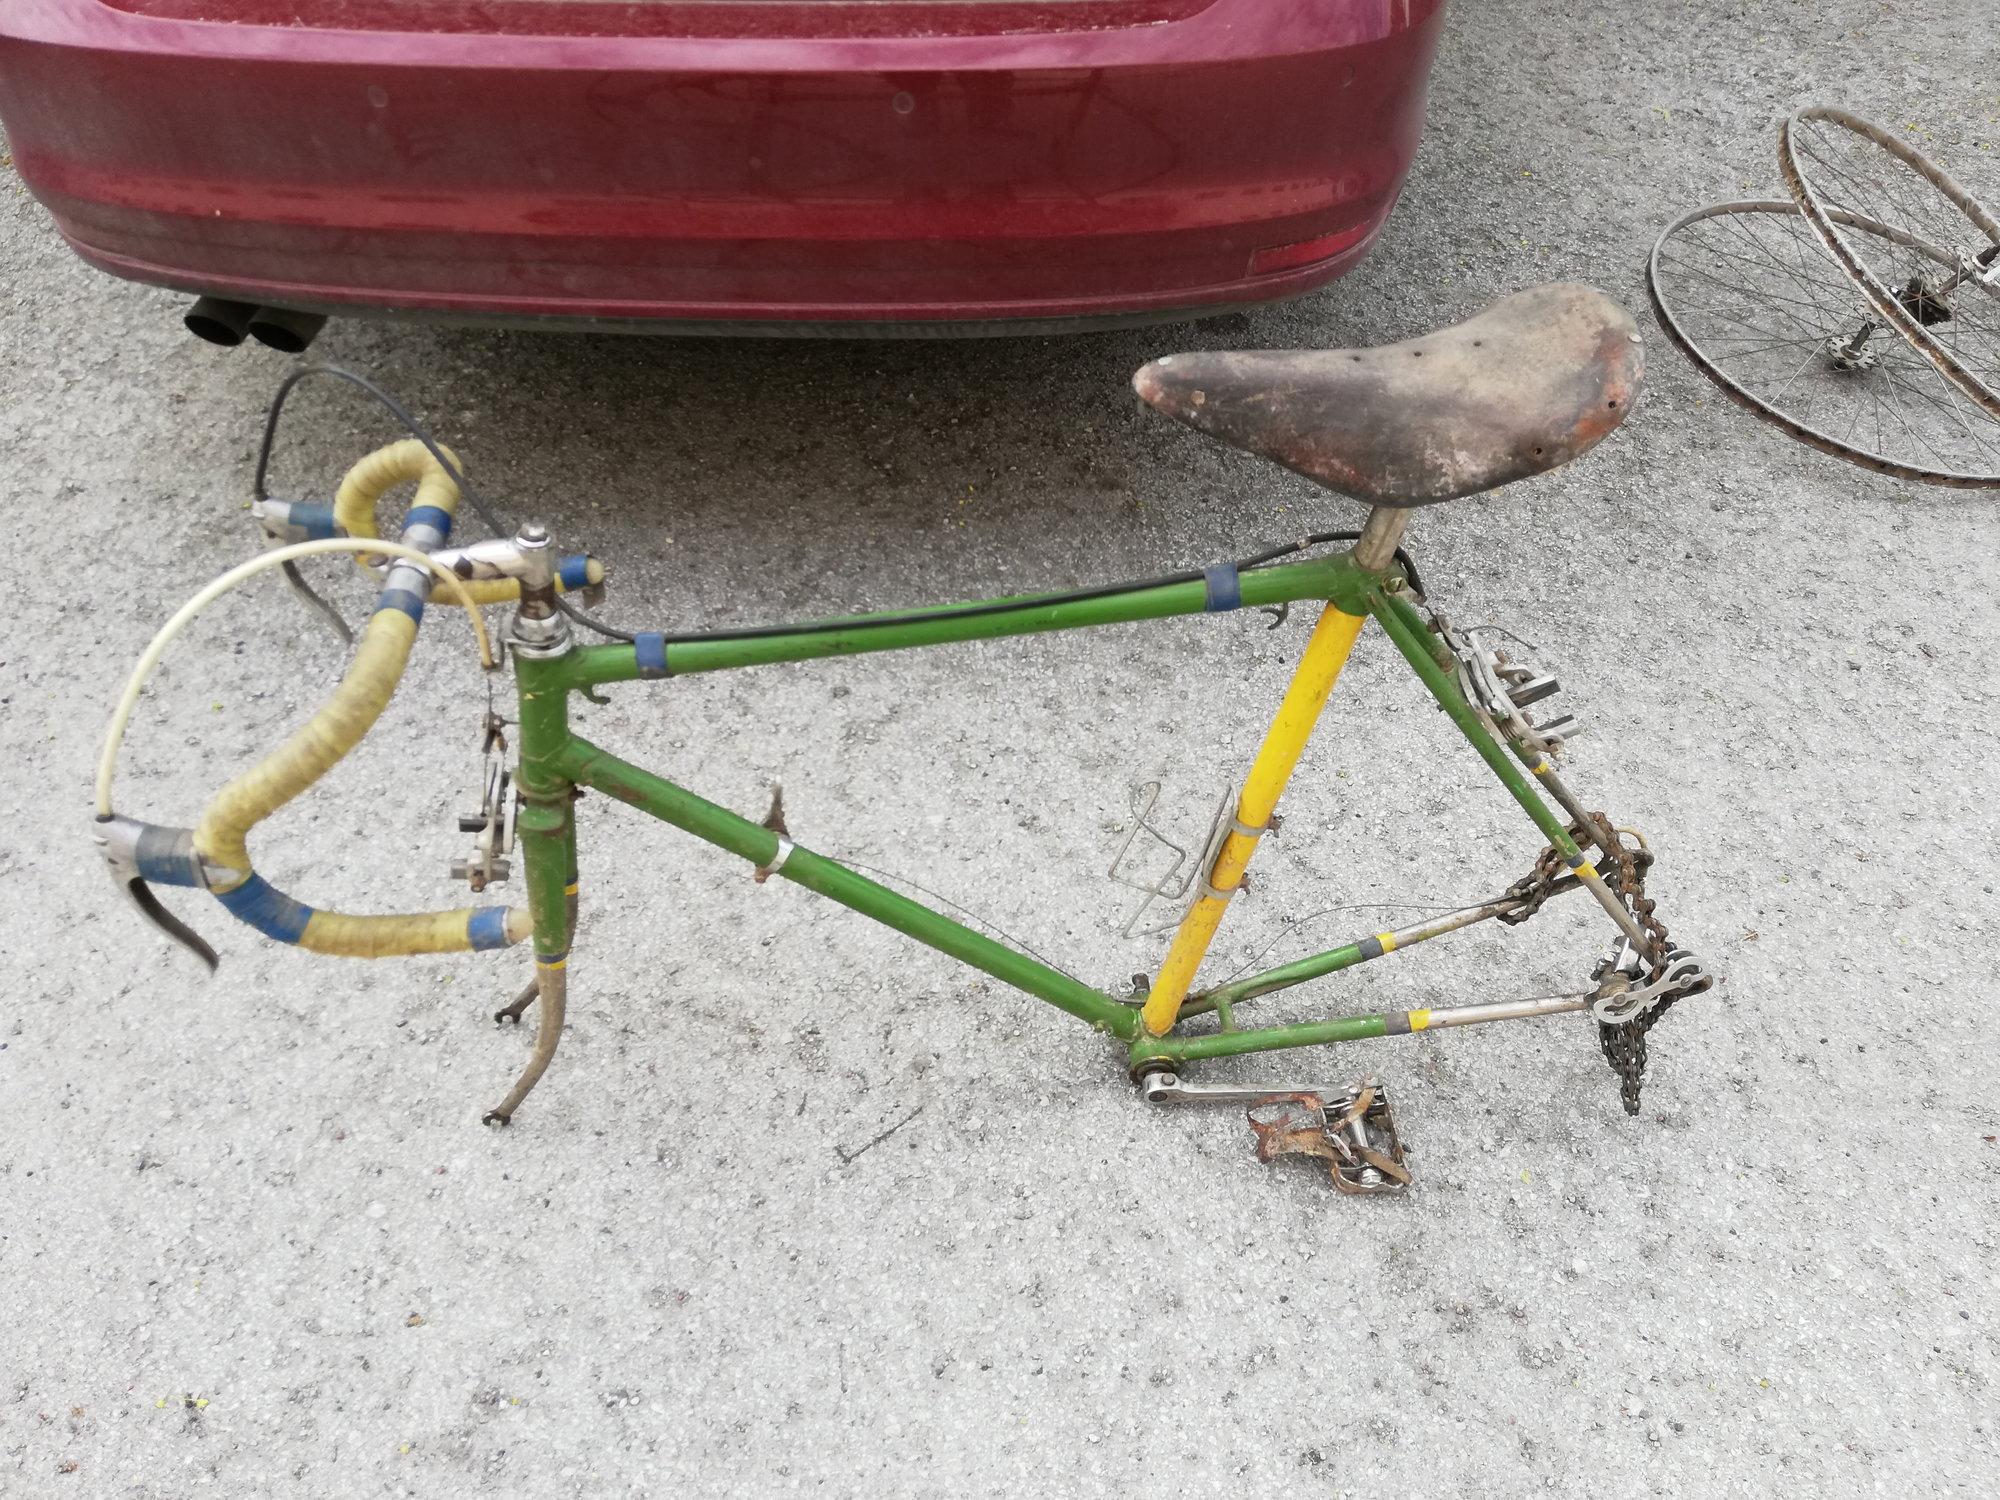 www.bikeforums.net